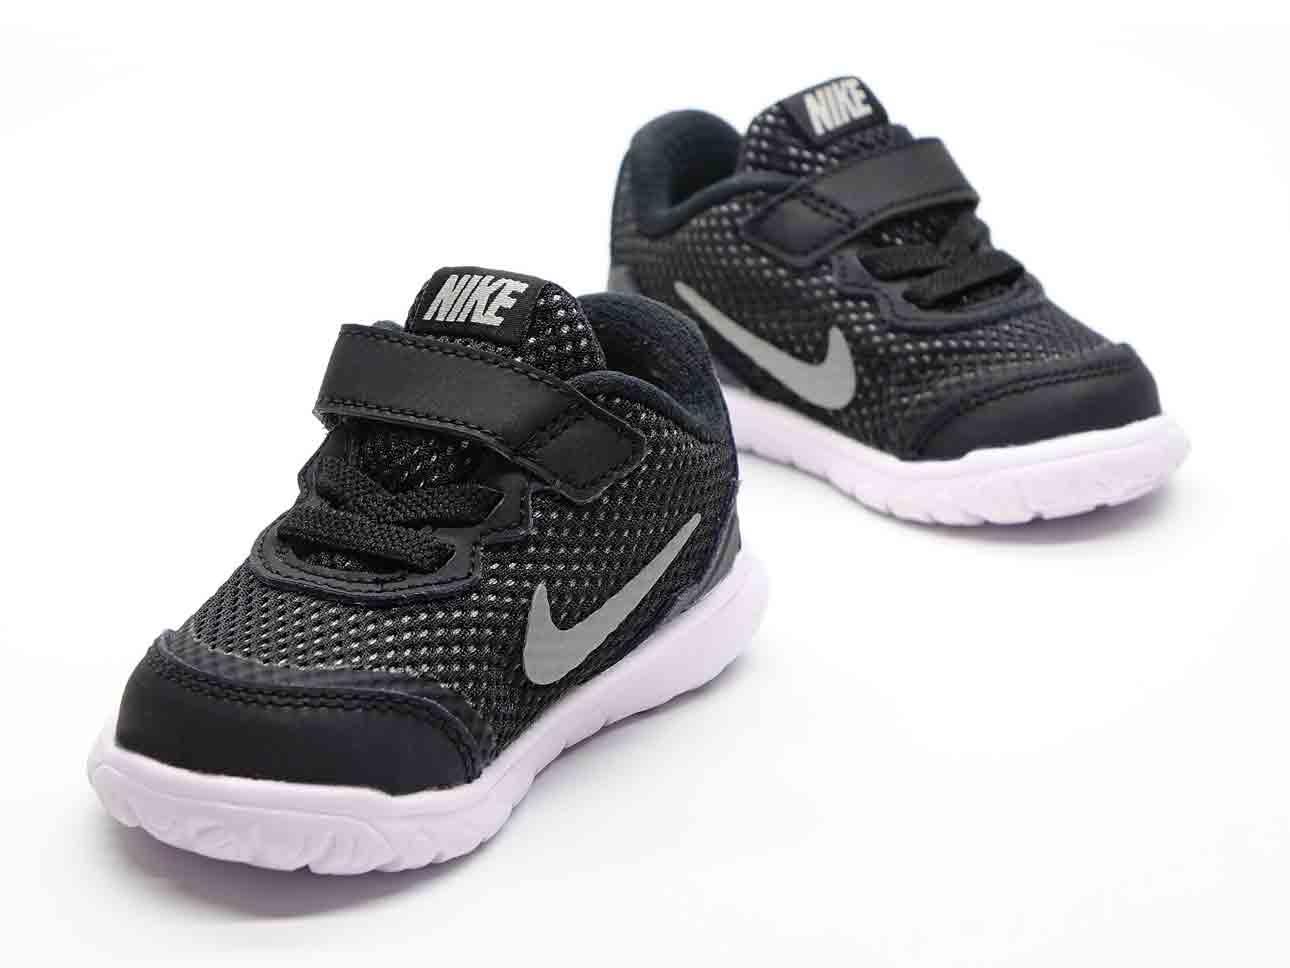 wide feet kids shoes